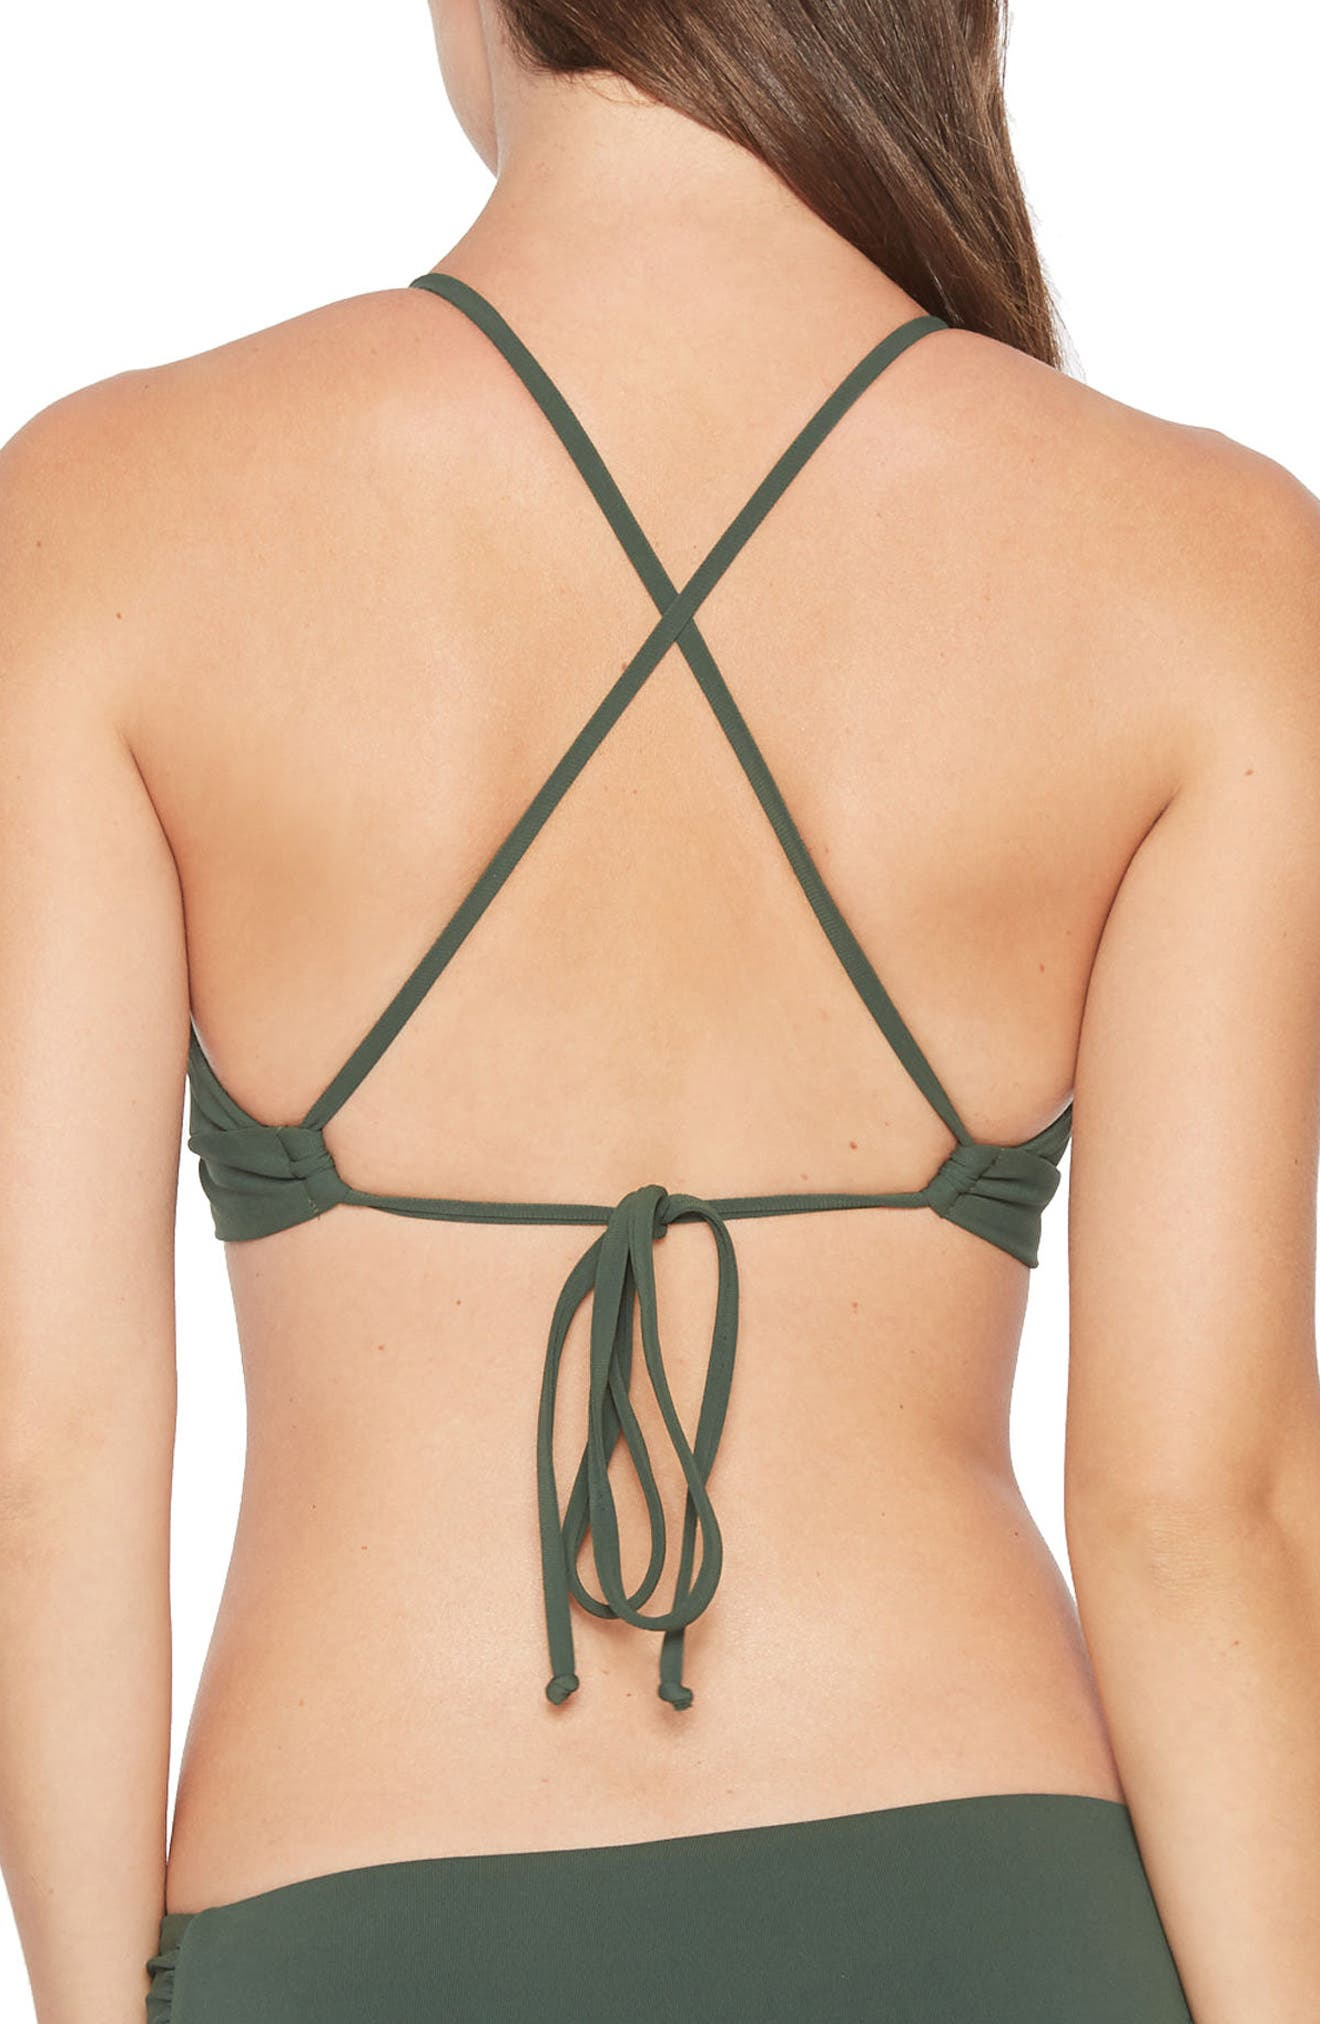 Ava Triangle Bikini Top,                             Alternate thumbnail 2, color,                             305